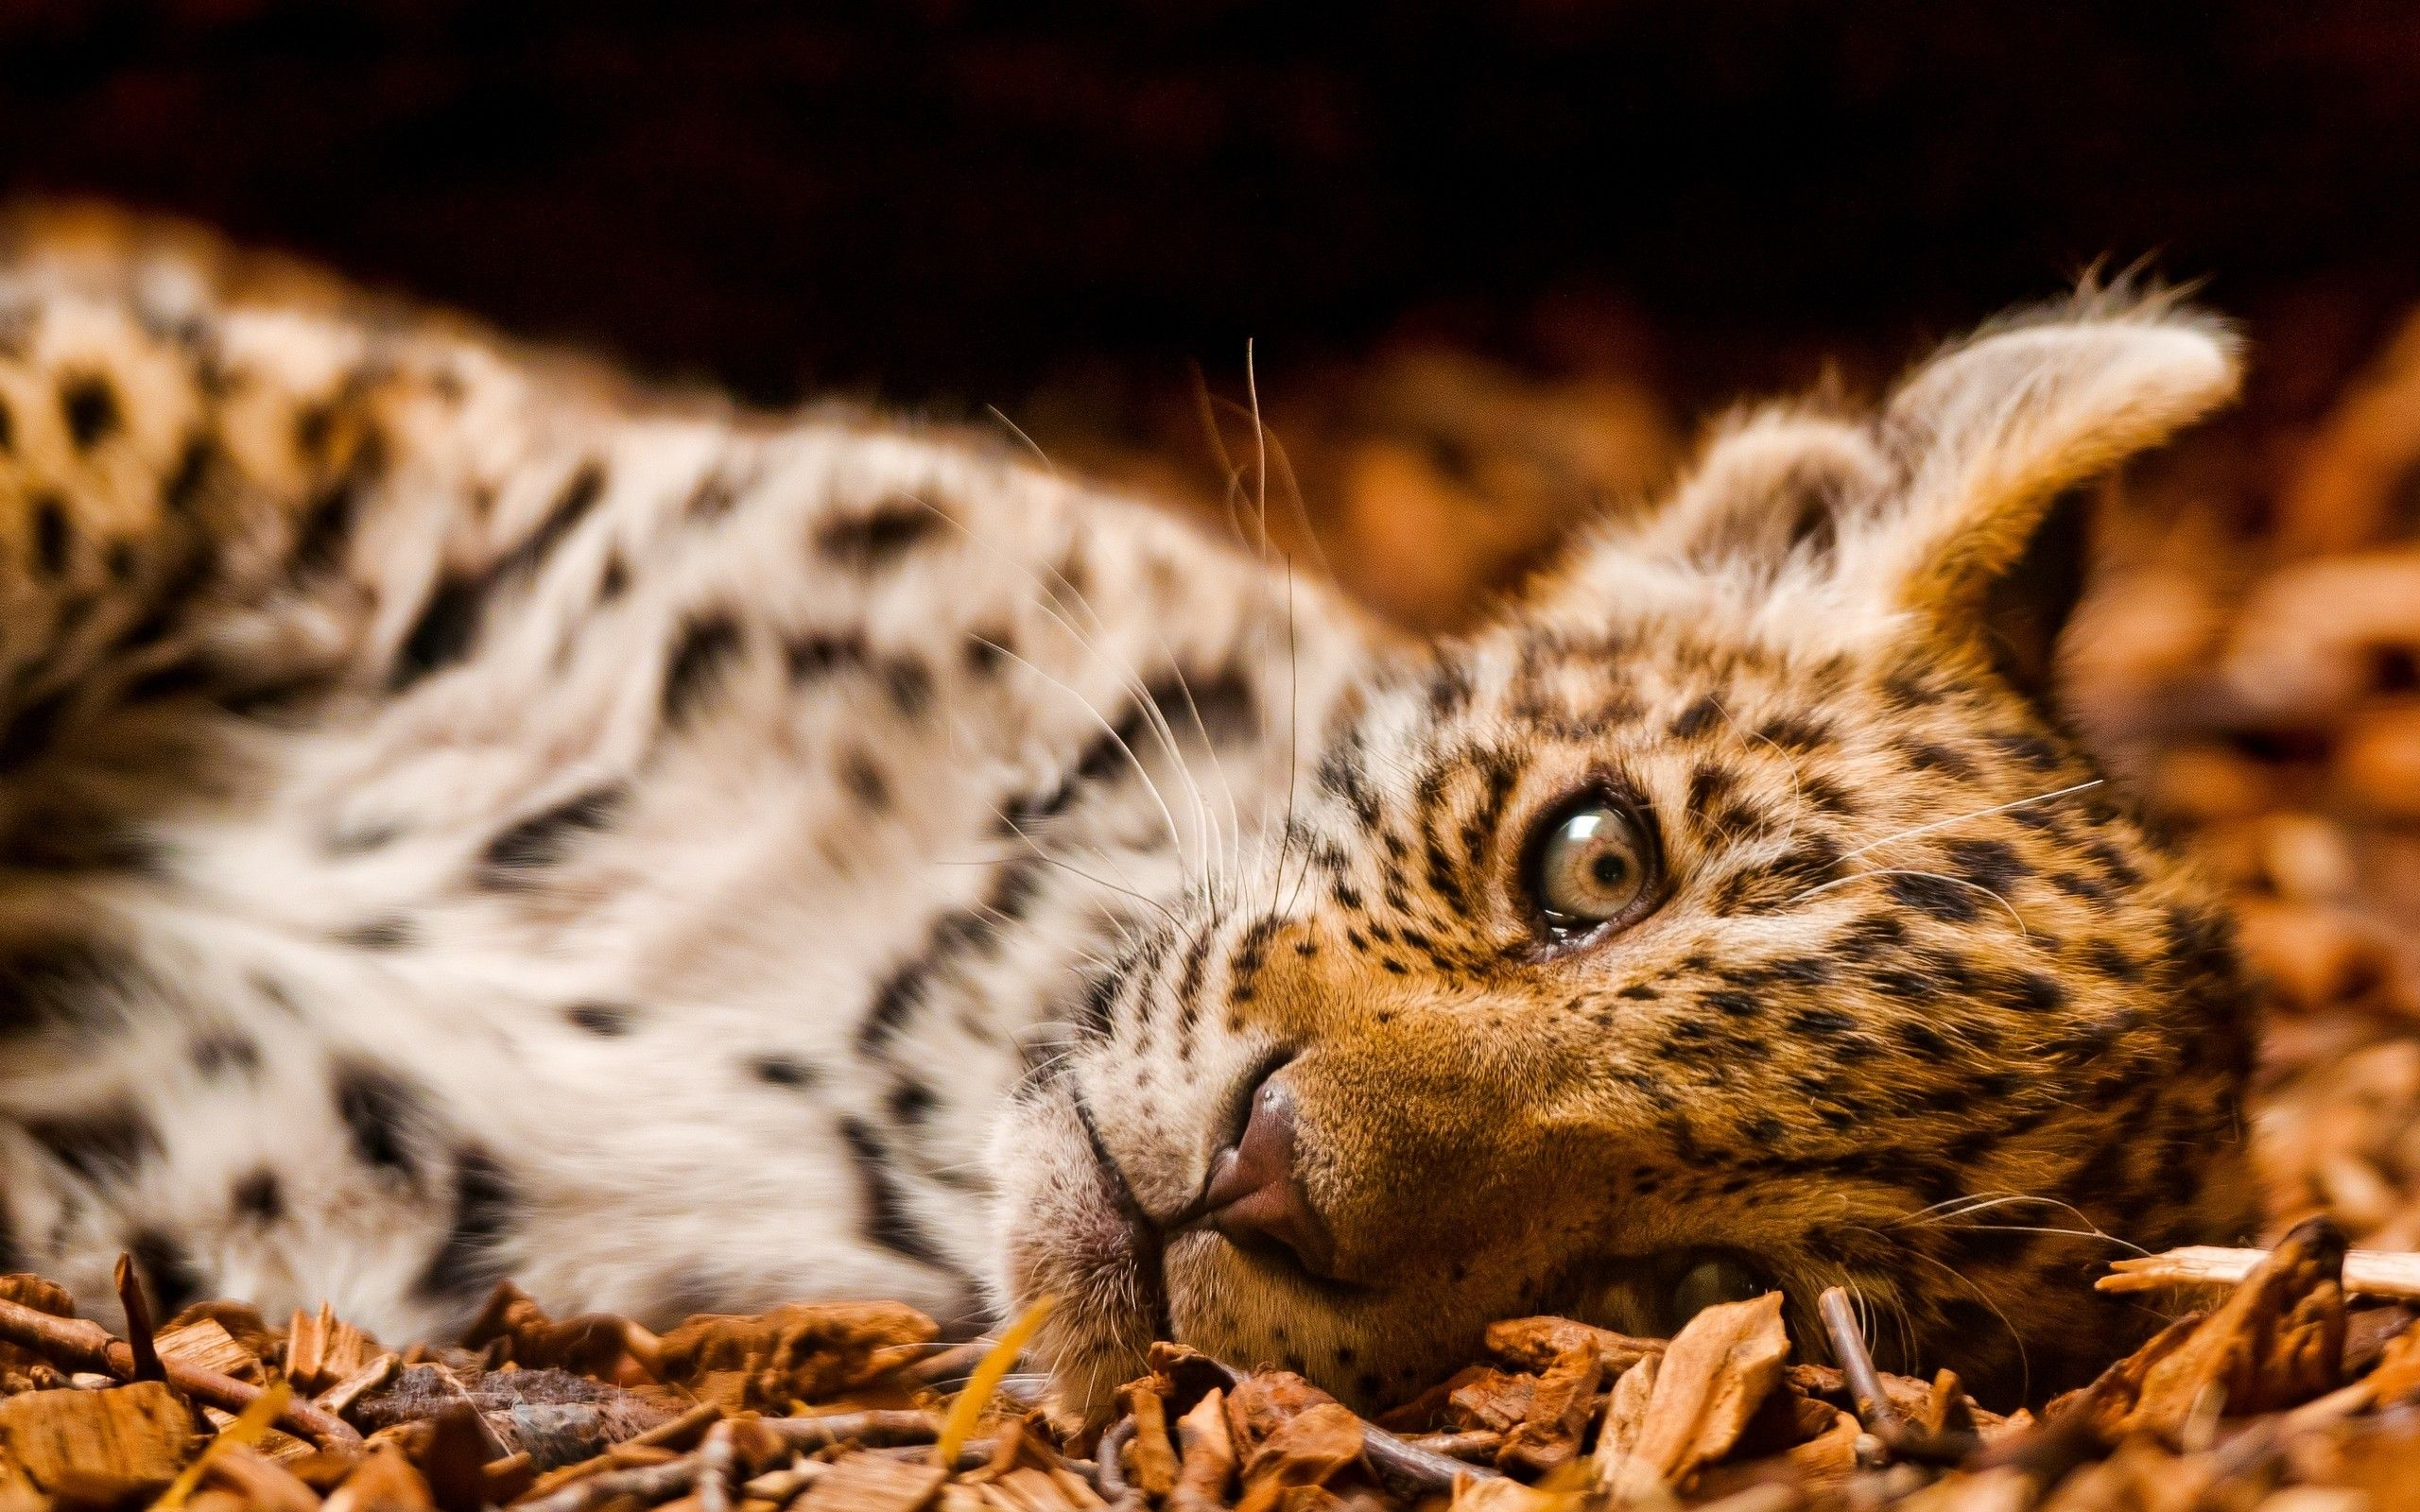 Cute Jaguar Wallpapers Top Free Cute Jaguar Backgrounds Wallpaperaccess